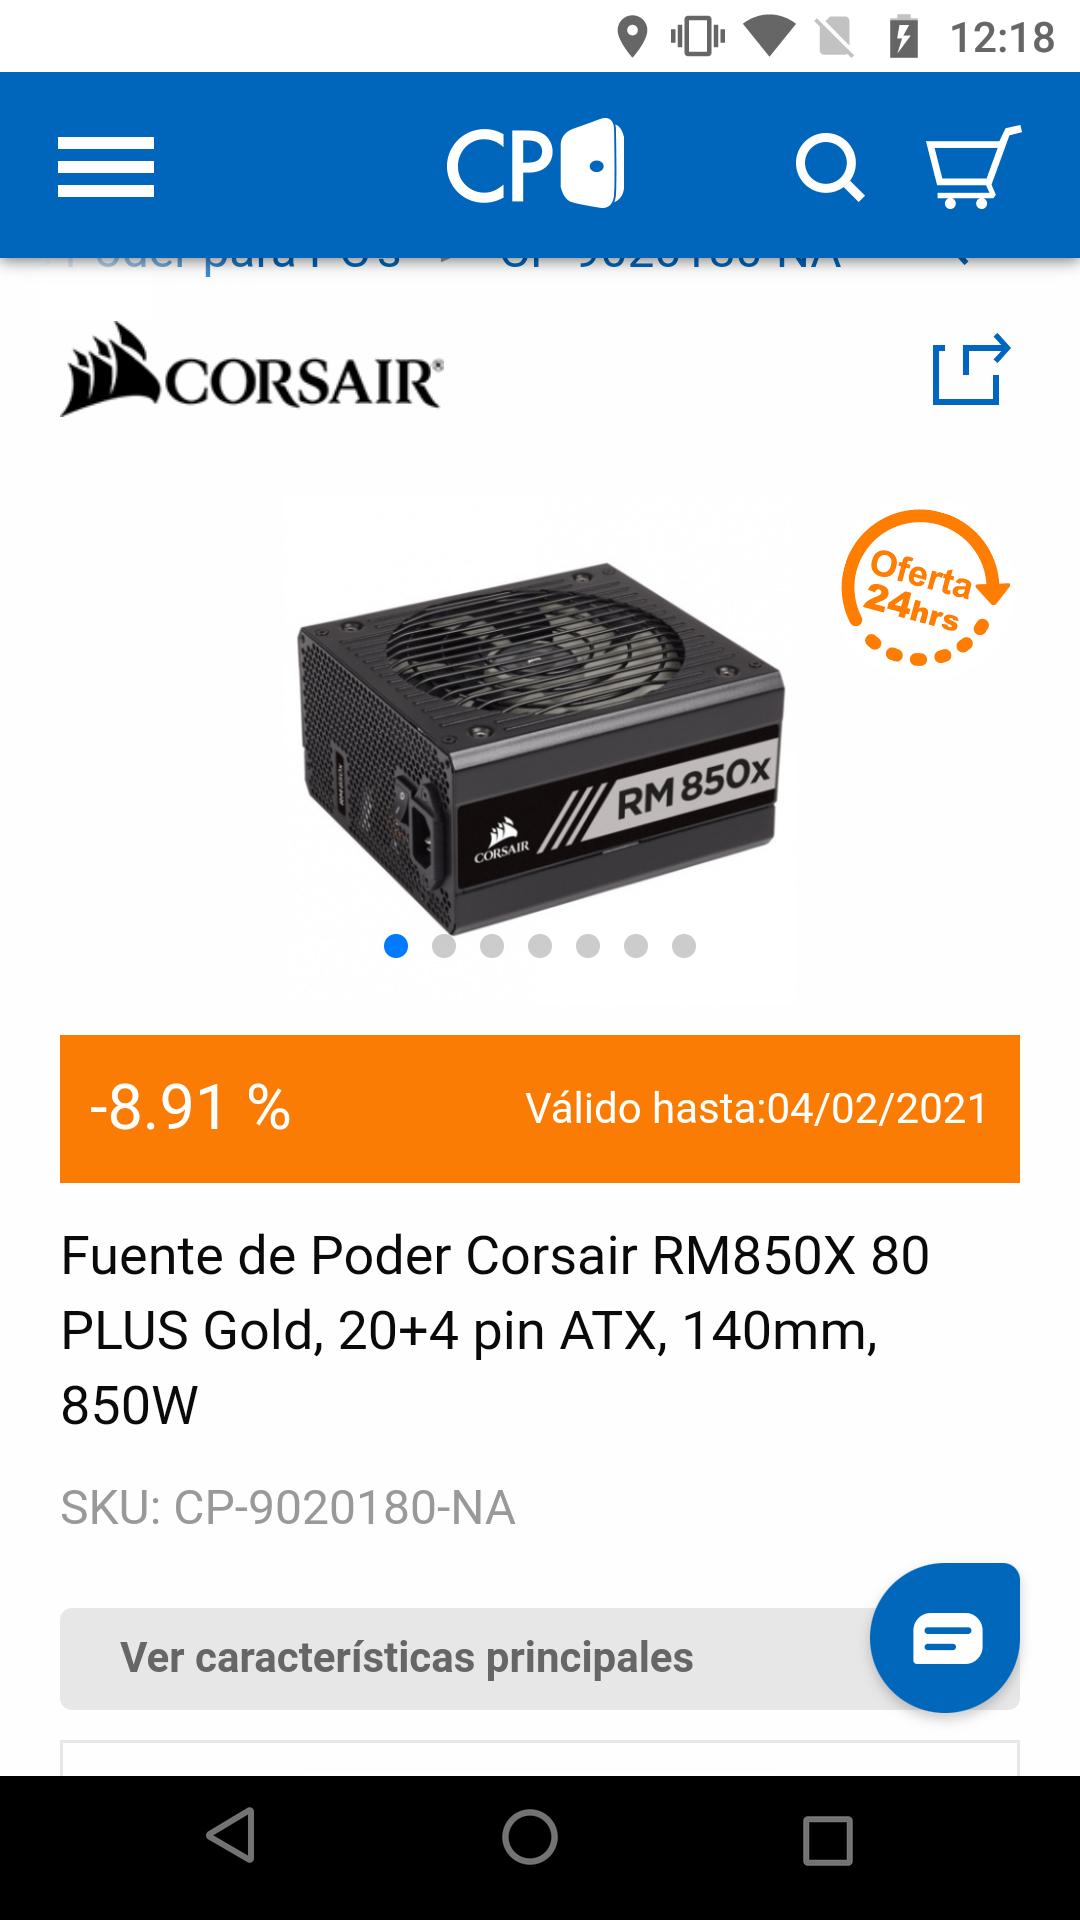 CyberPuerta Fuente de Poder Corsair RM850X 80 PLUS Gold, 20+4 pin ATX, 140mm, 850W